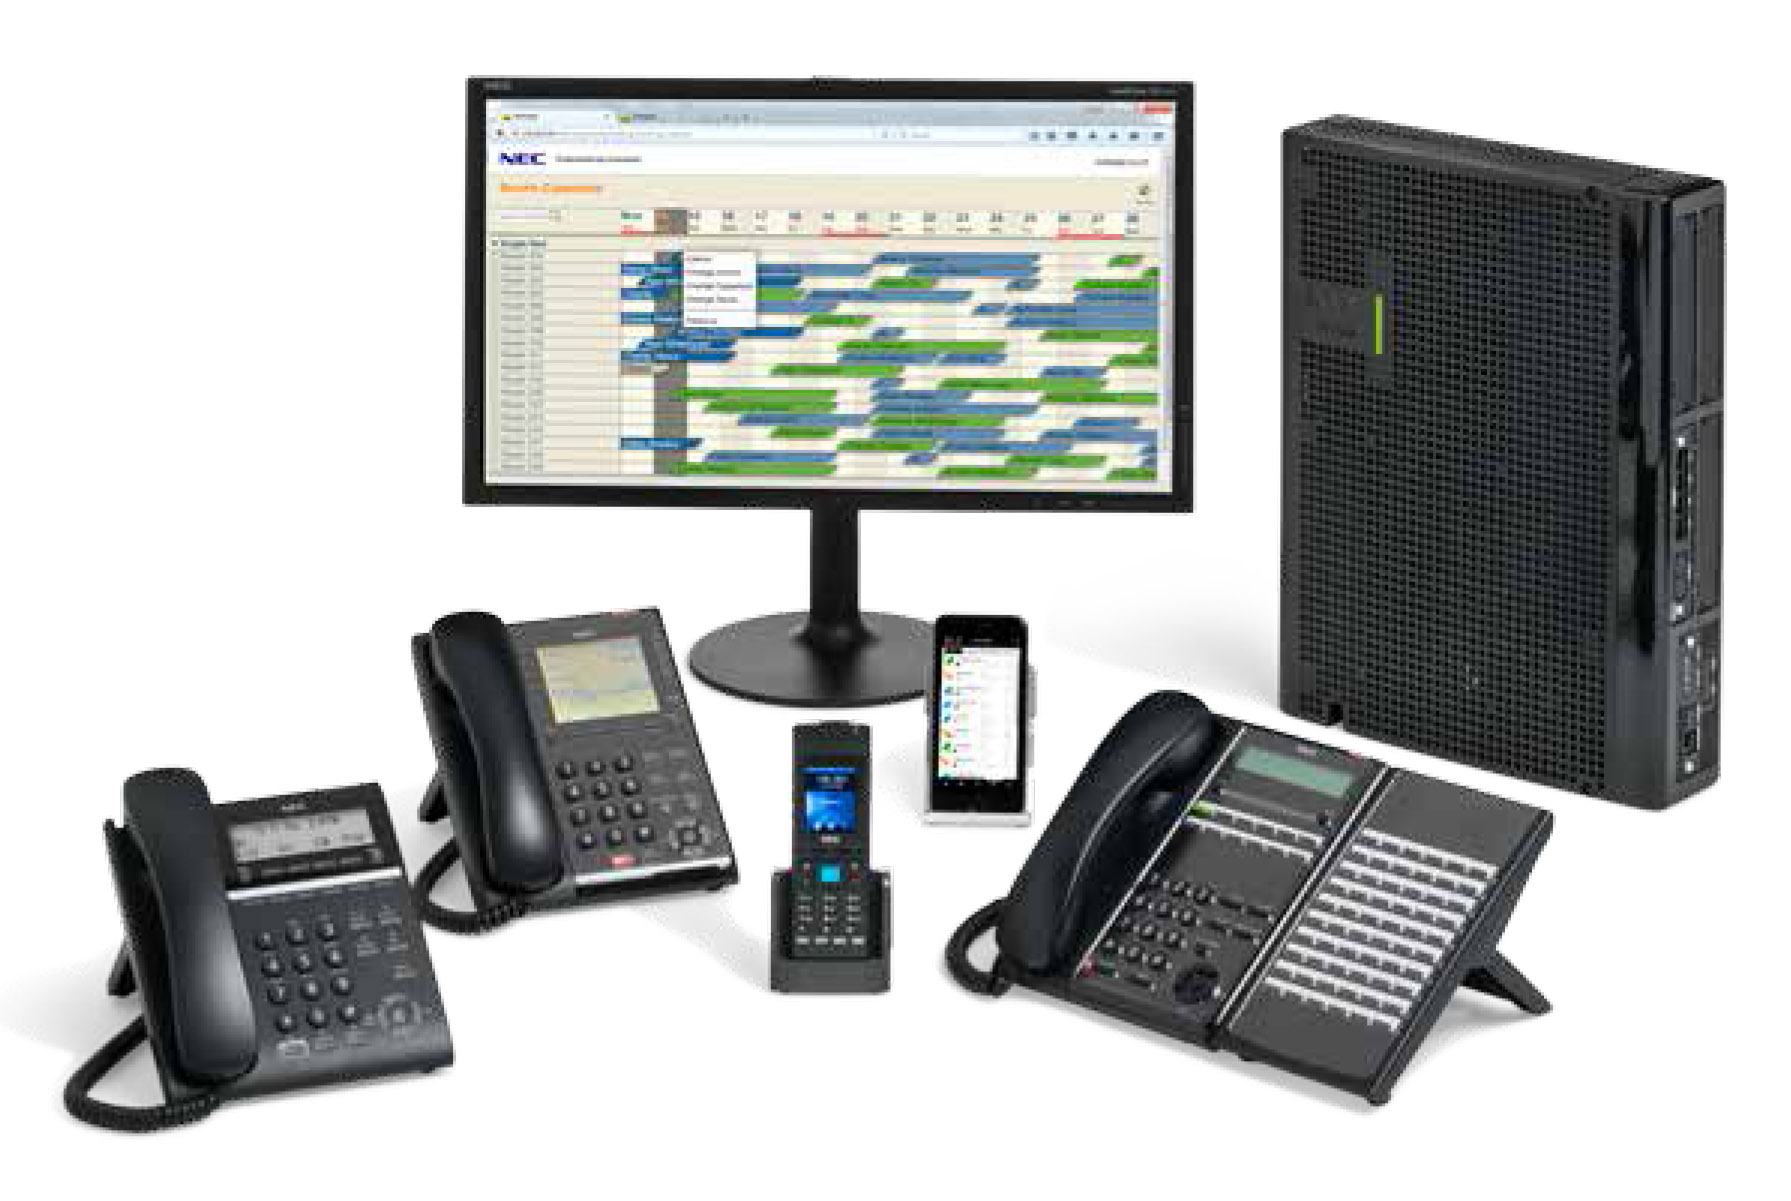 NEC SL2100-3 PABX System Dubai